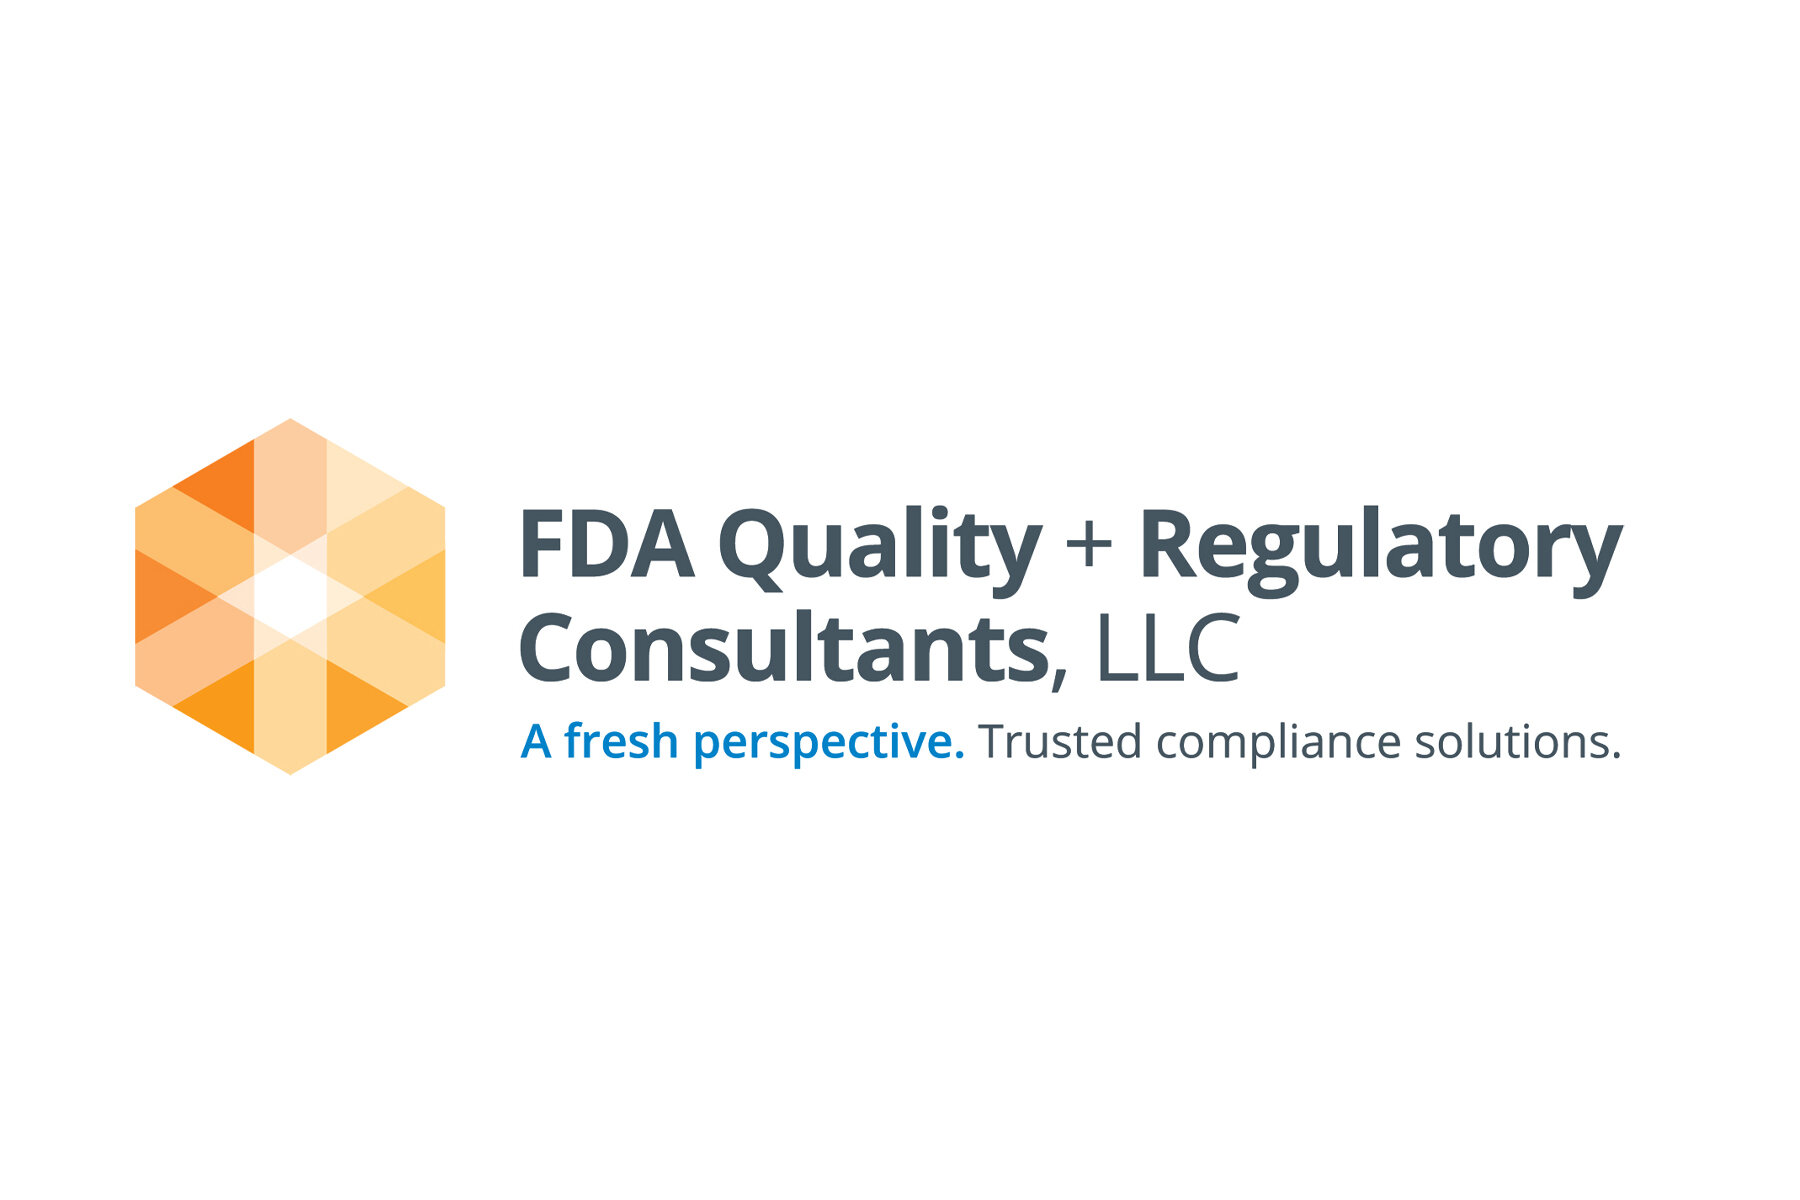 FDAQRCrgb.jpg